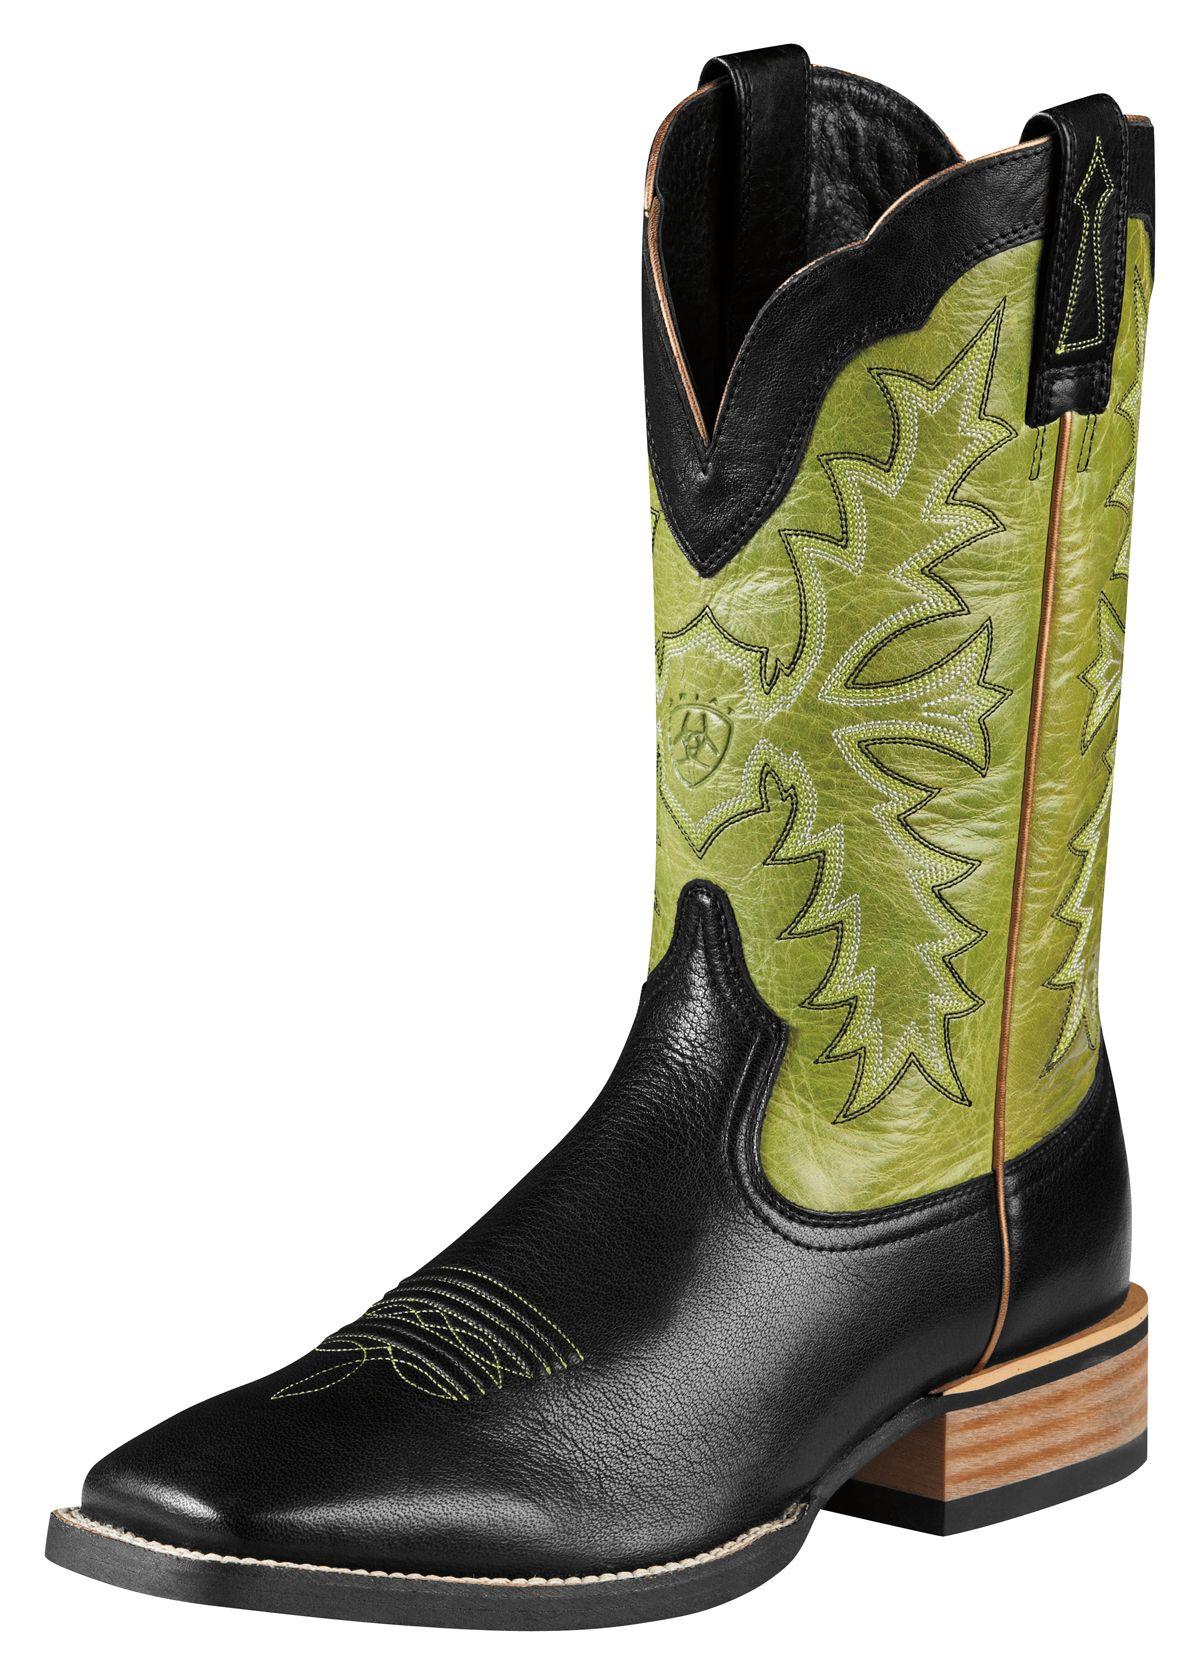 Mens Sweetwater Cowboy Boots | valleyvet.com